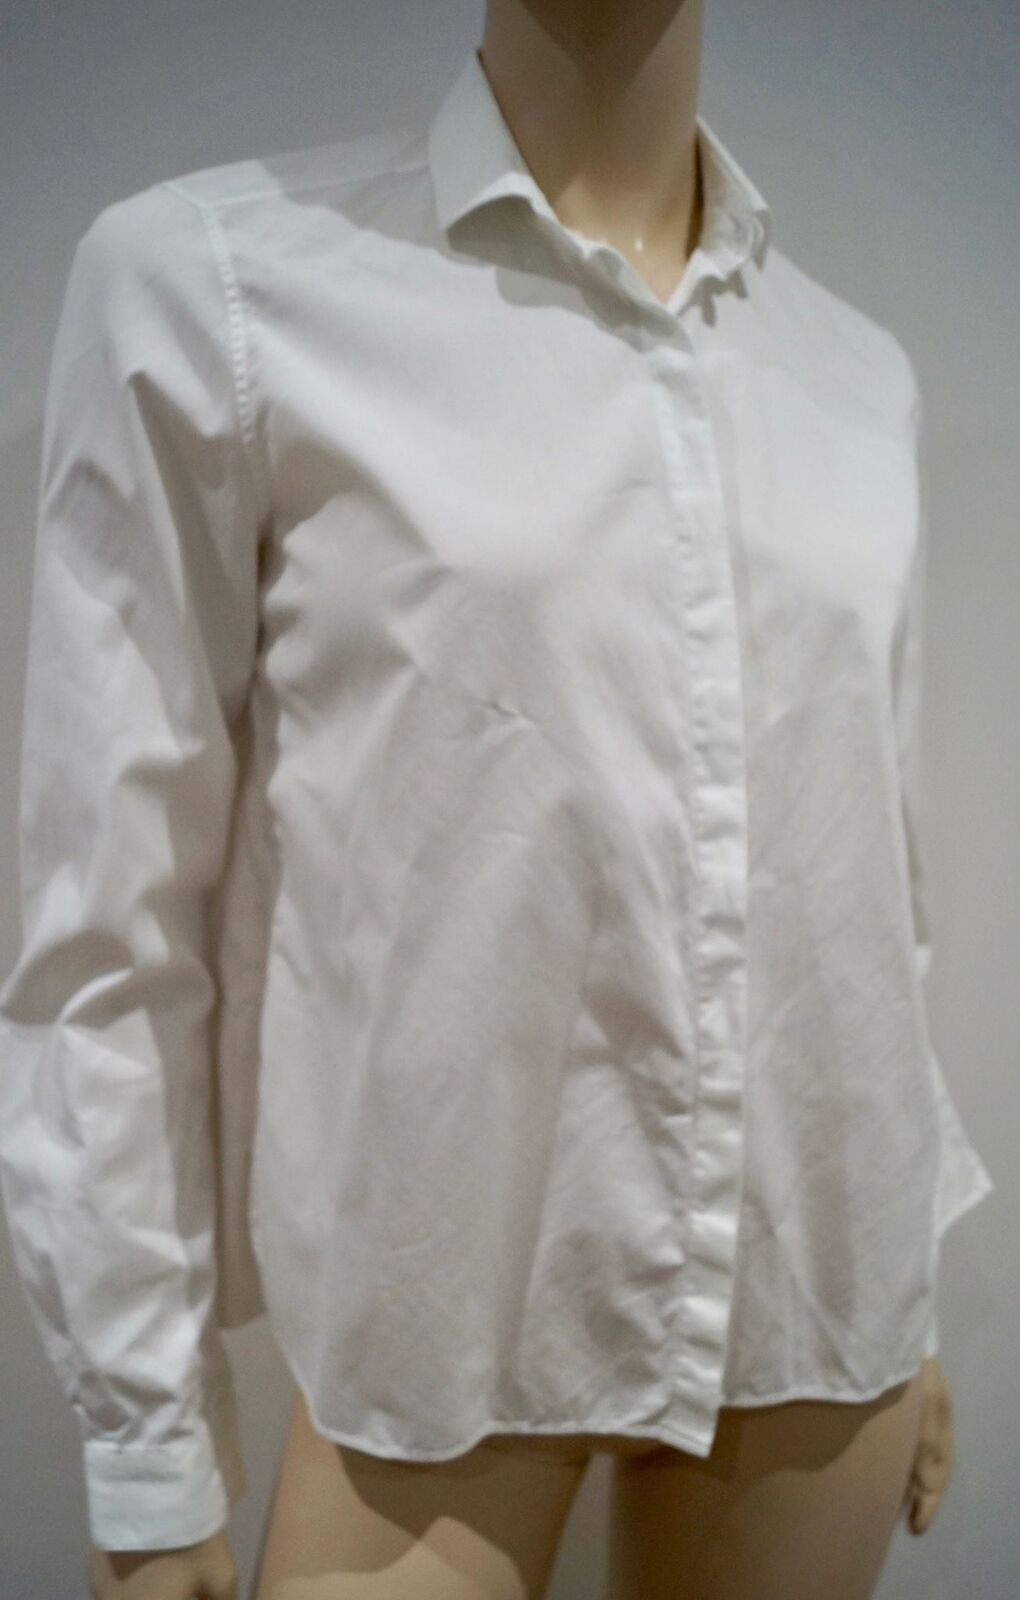 VALENTINO Weiß Collarot Pleated Rear Hemline Formal Blouse Shirt Top IT42 UK10